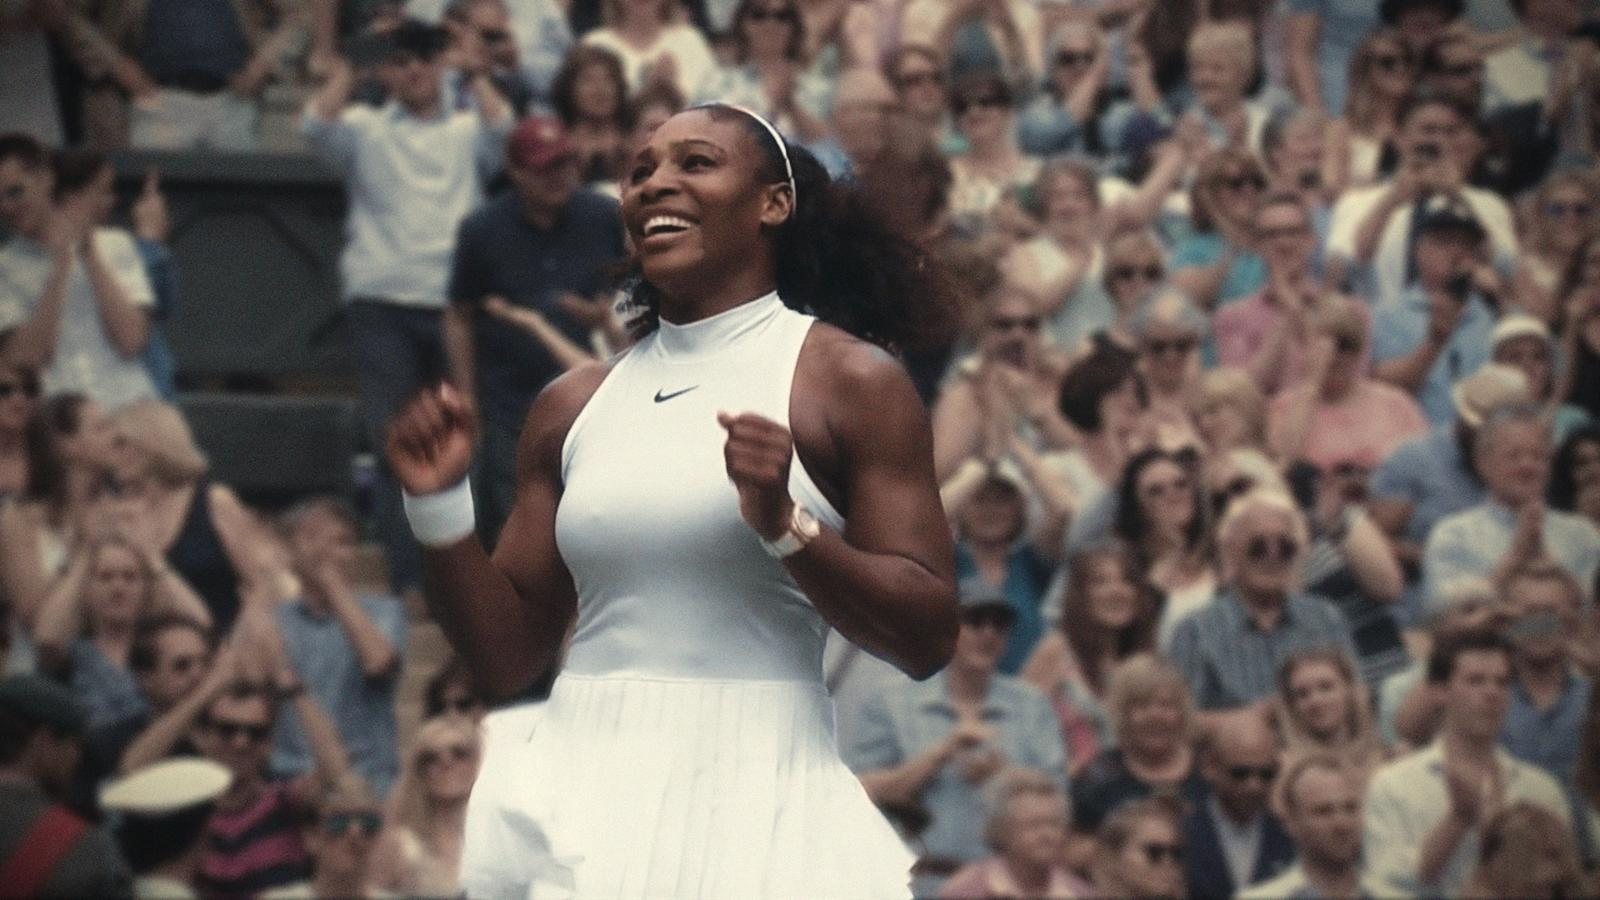 Tennis whites frm314.0001 4  hd 1600